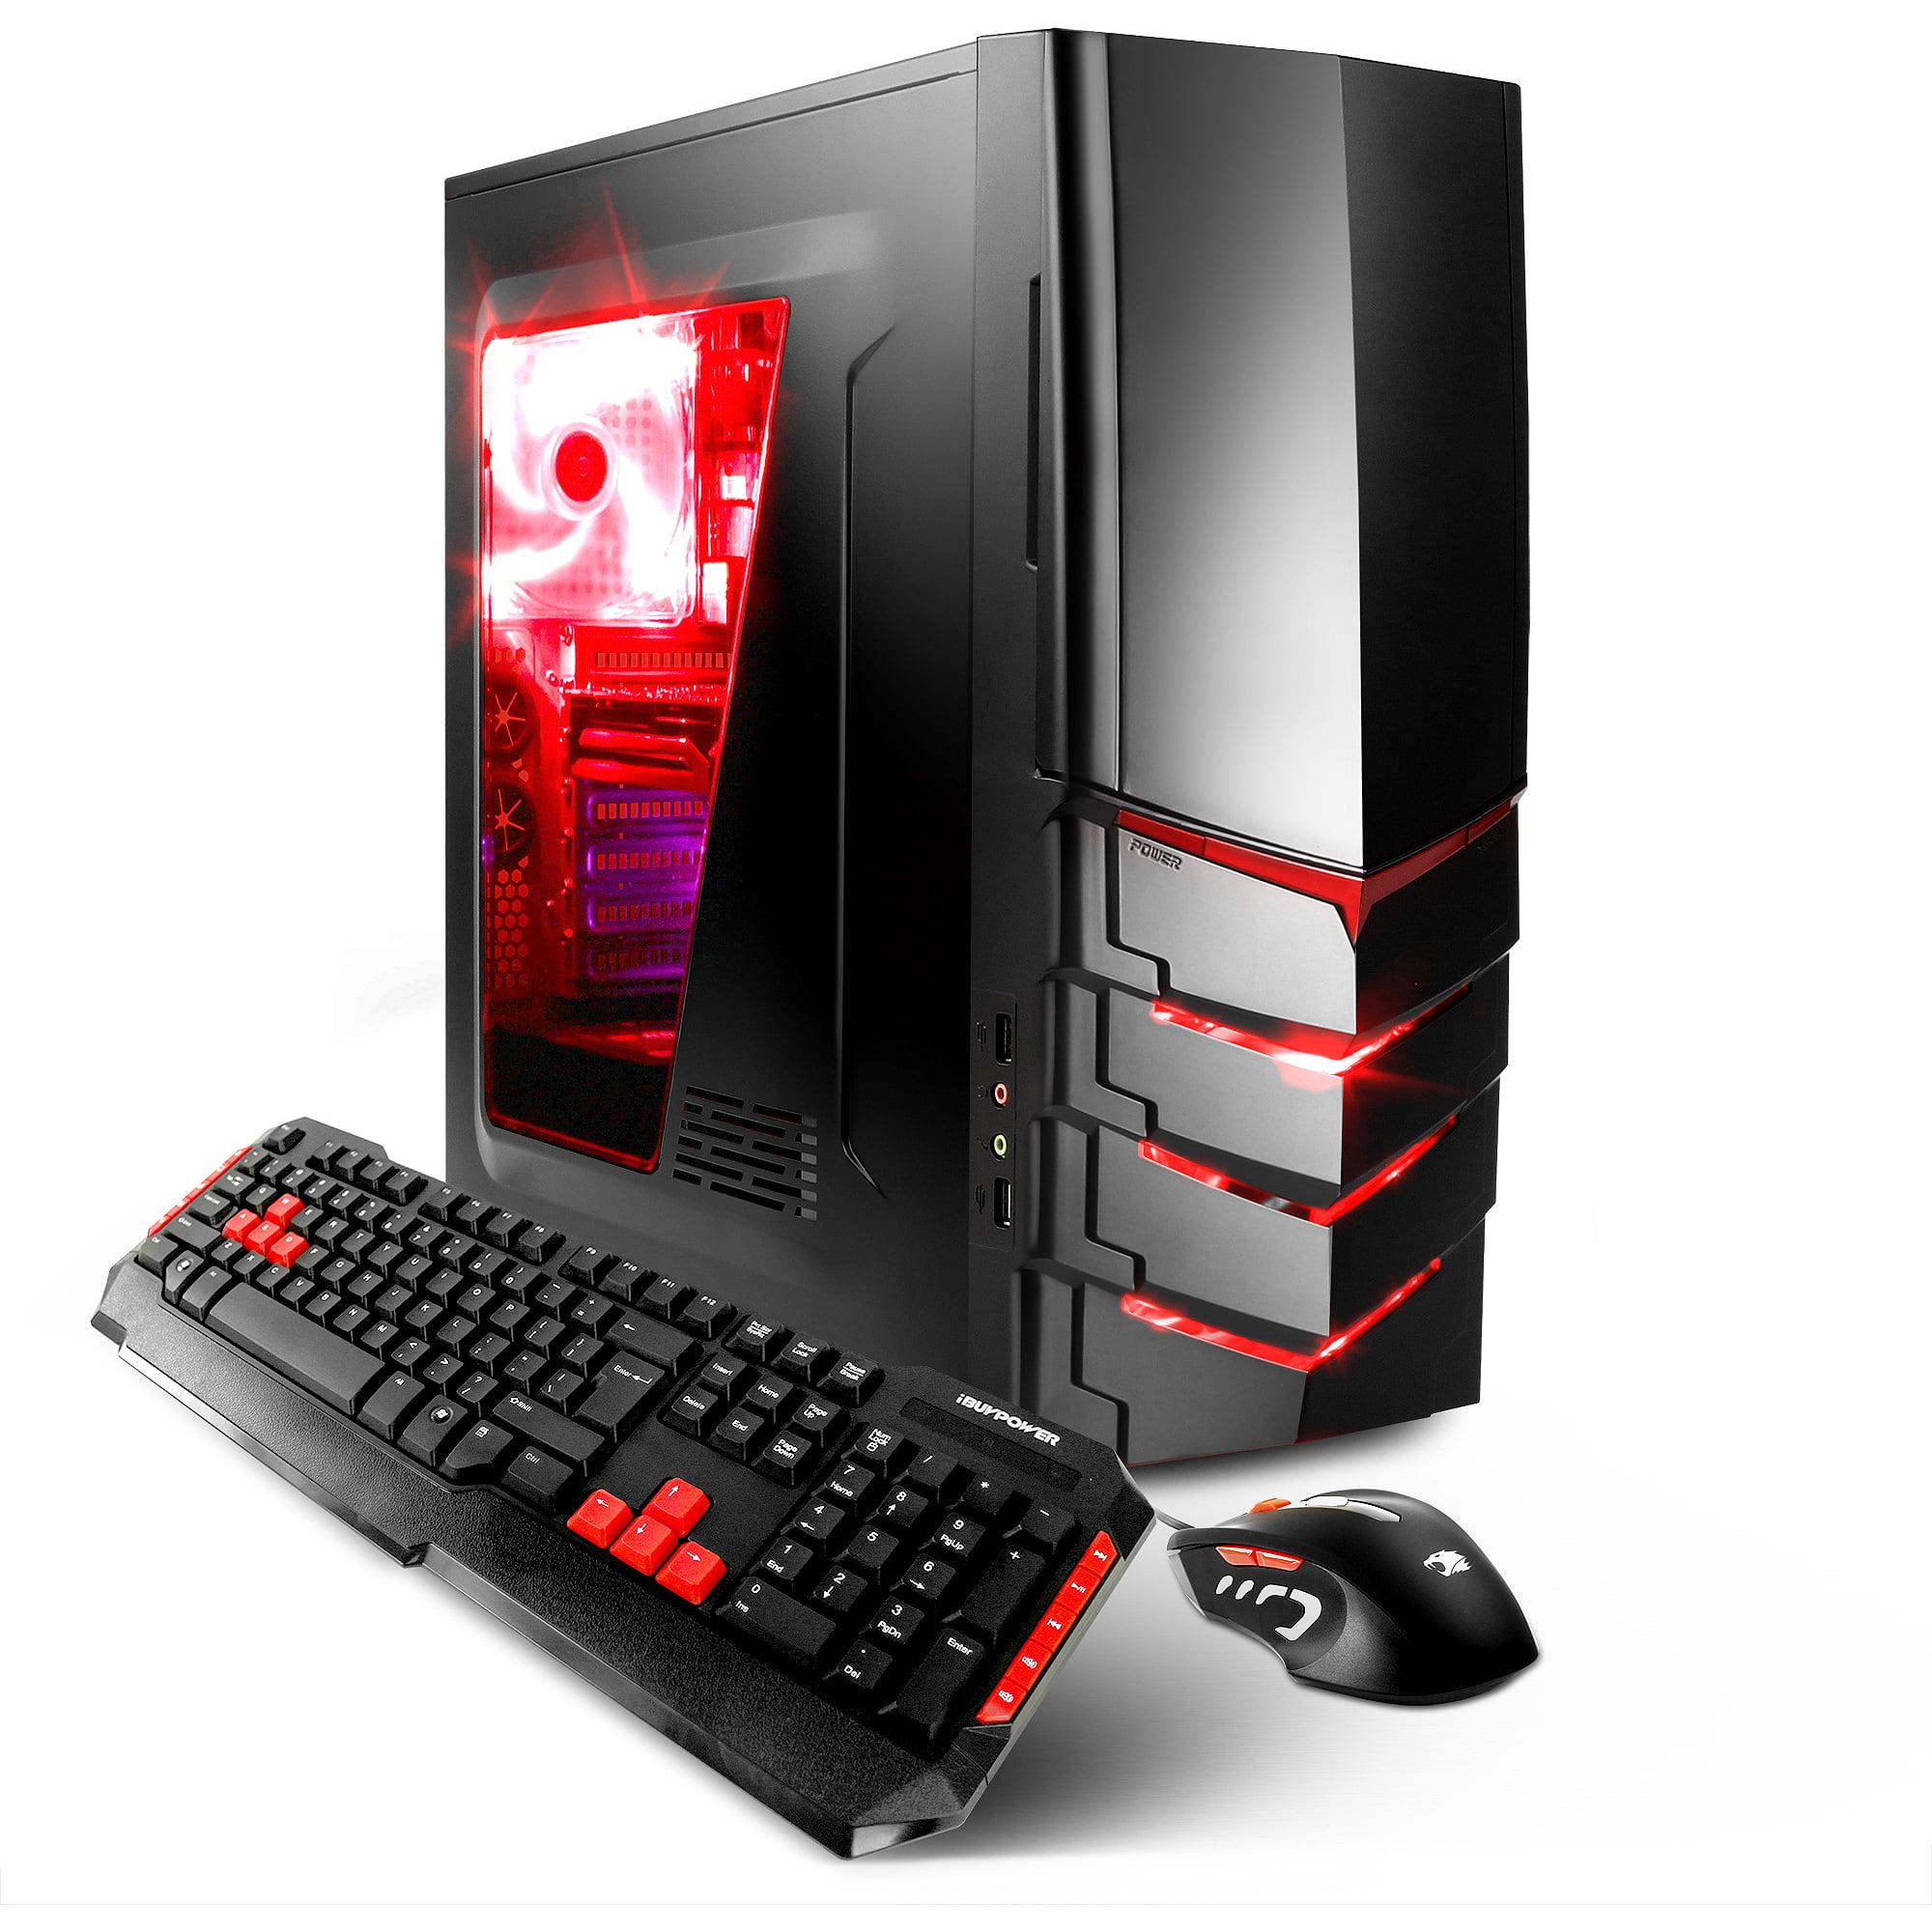 iBUYPOWER Black GAMER WA540B Gaming Desktop PC with AMD FX-4300 Vishera Quad-Core Processor, 4GB Memory, 500GB Hard Drive and Windows 10 Home (Monitor Not Included)